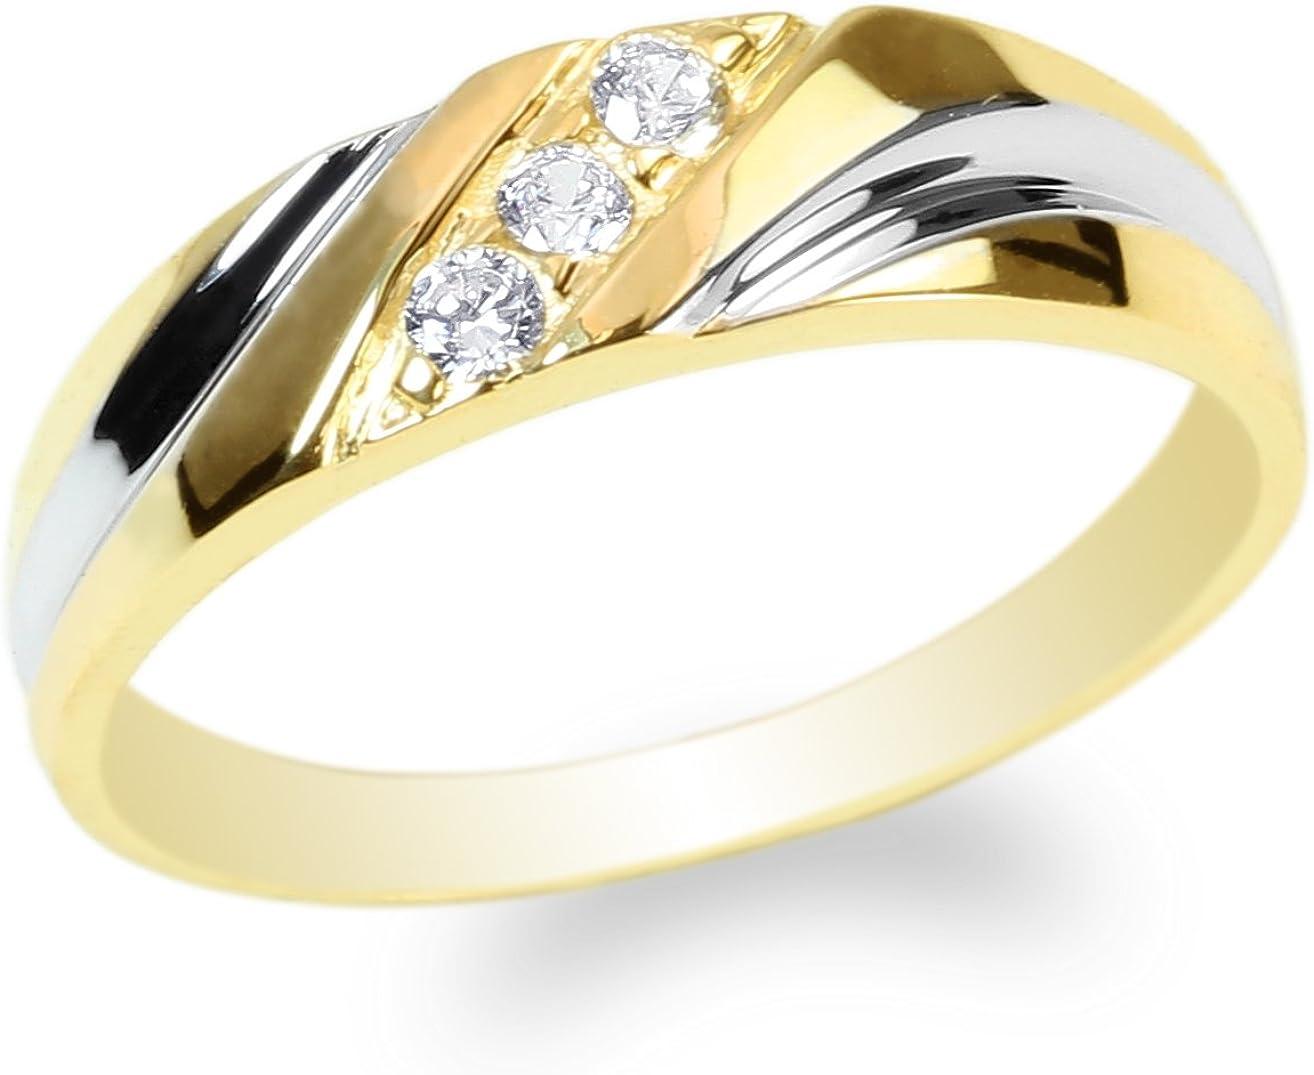 JamesJenny Ladies 10K Yellow Gold Round CZ Beautiful Two Tone Wedding Band Ring Size 4-10